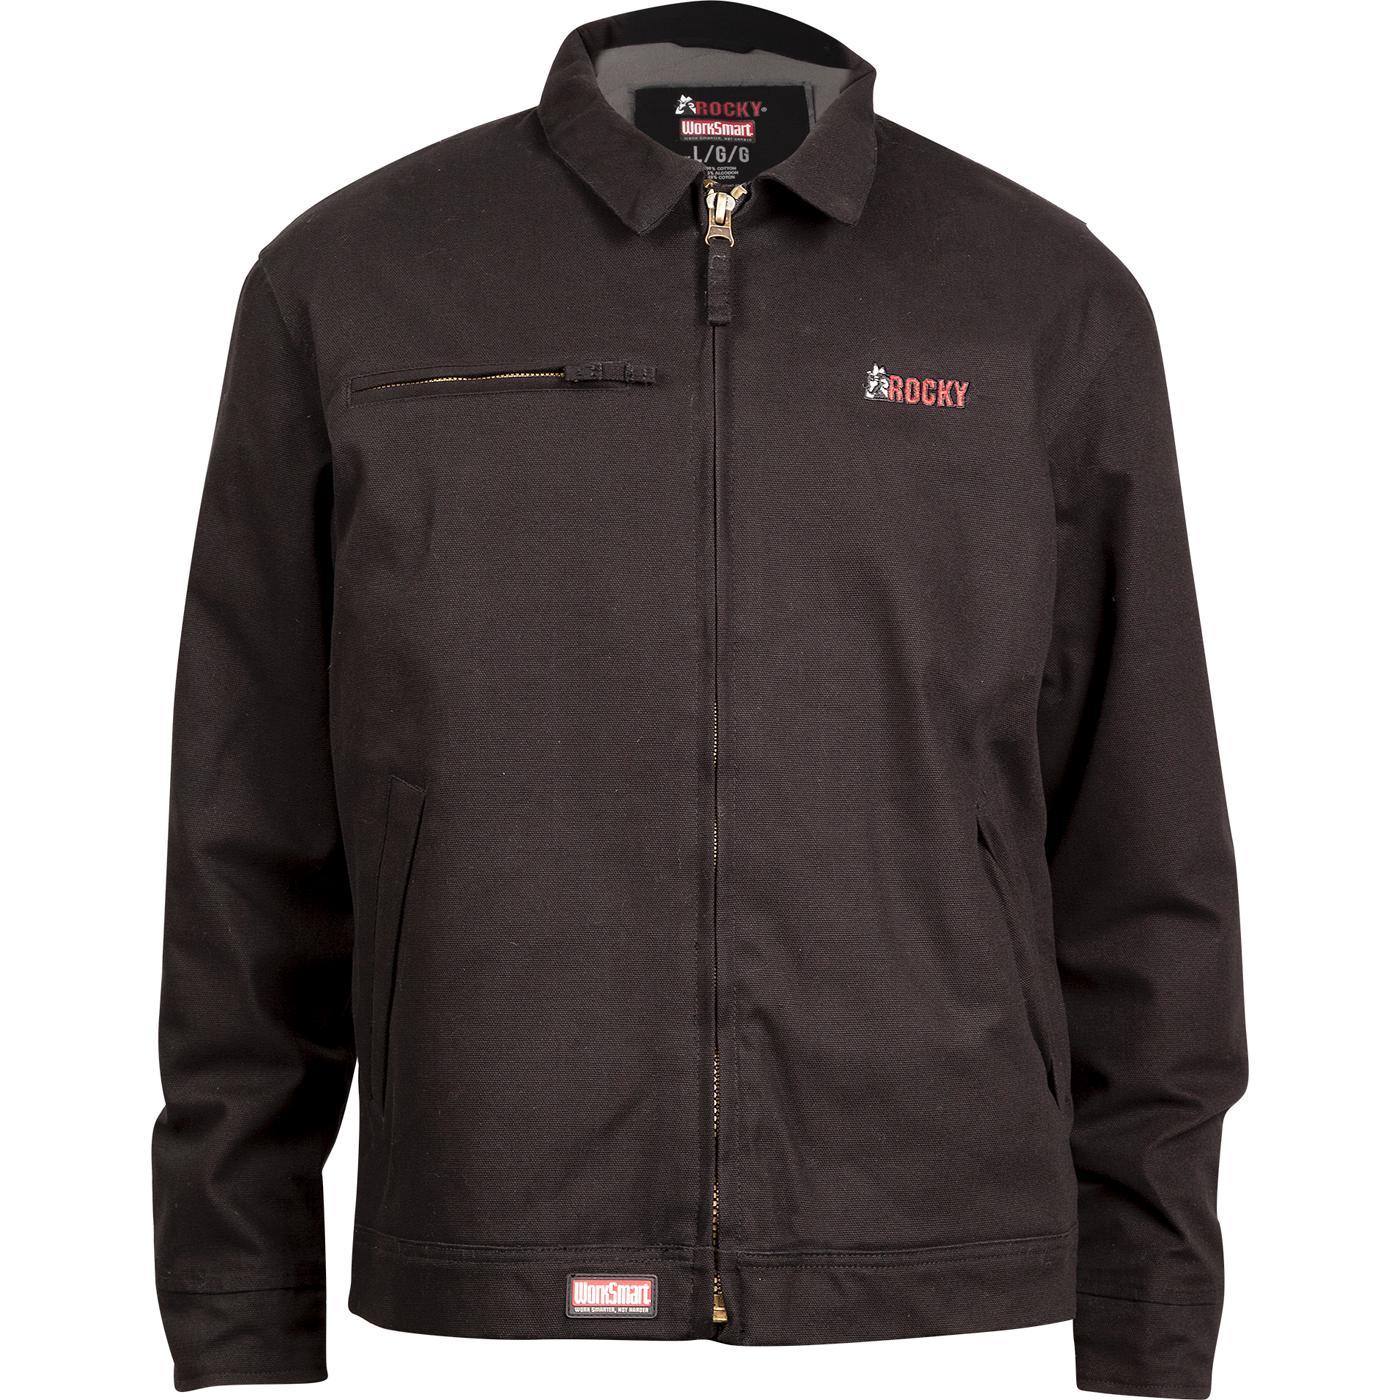 Rocky WorkSmart Waterproof Insulated Work Jacket. #WW00001